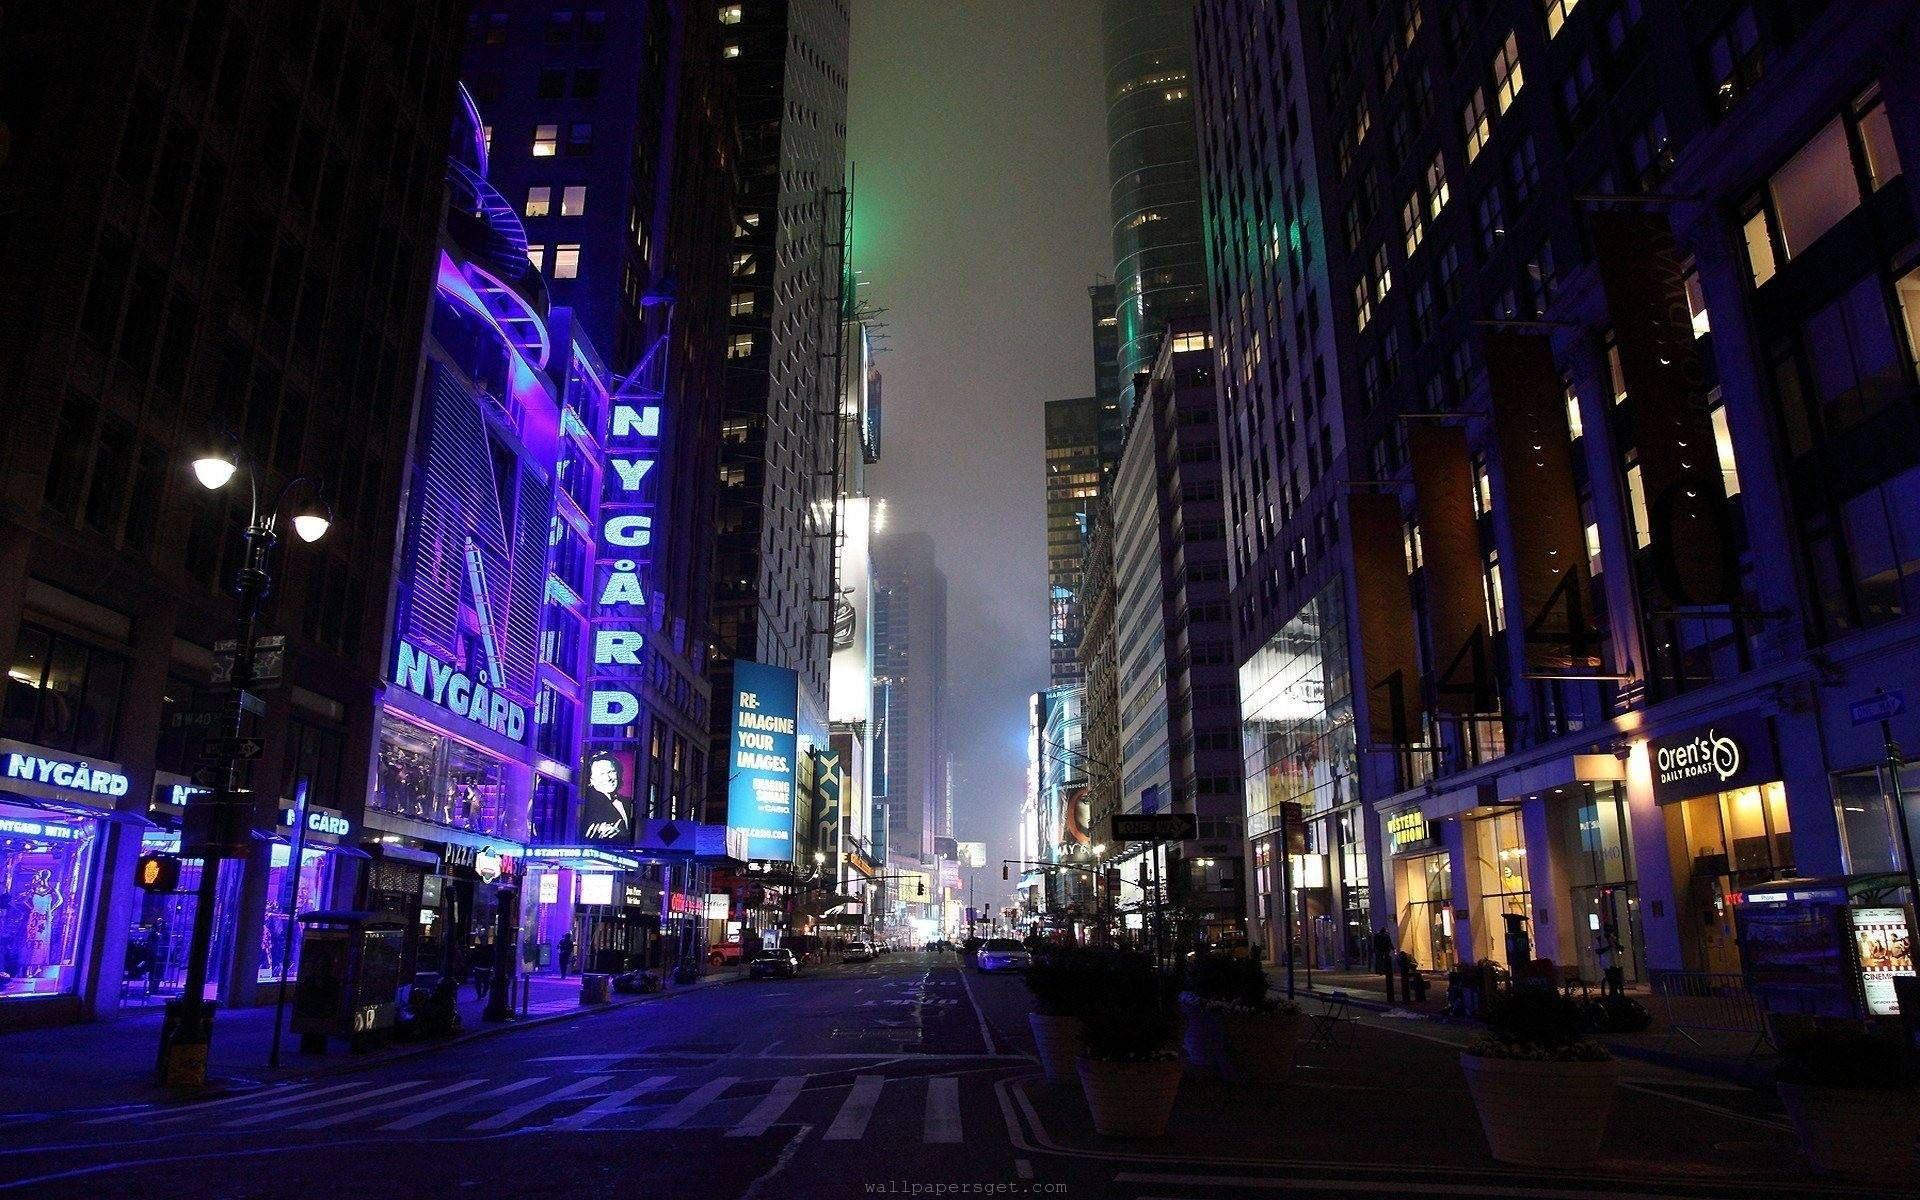 New York City Streets At Night City Lights At Night Night City